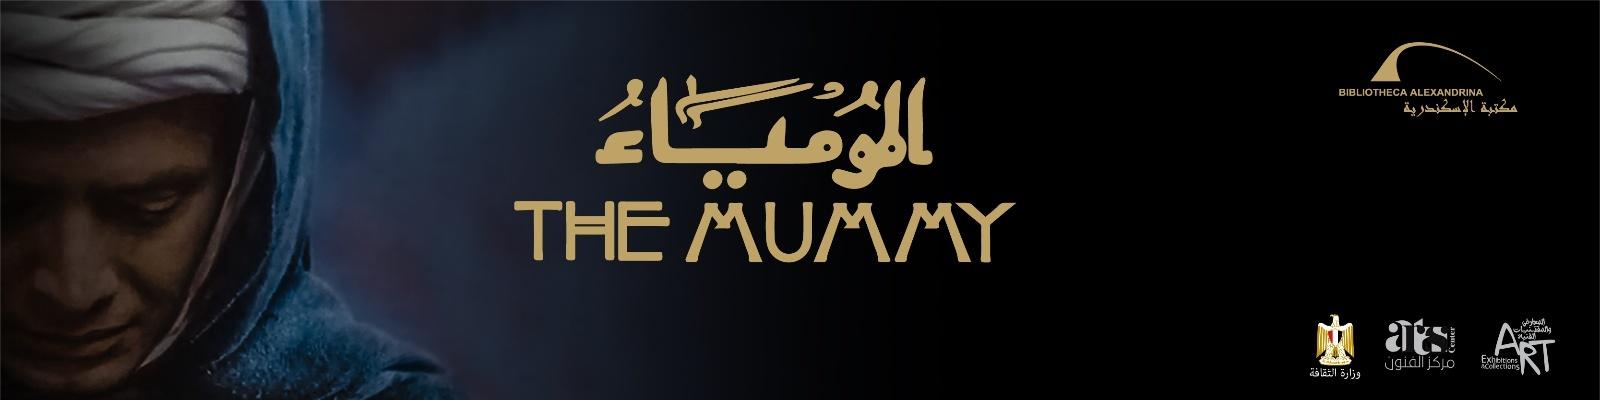 Debut Screening: Restored Copy of Shadi Abdel Salam's <i>The Mummy</i>